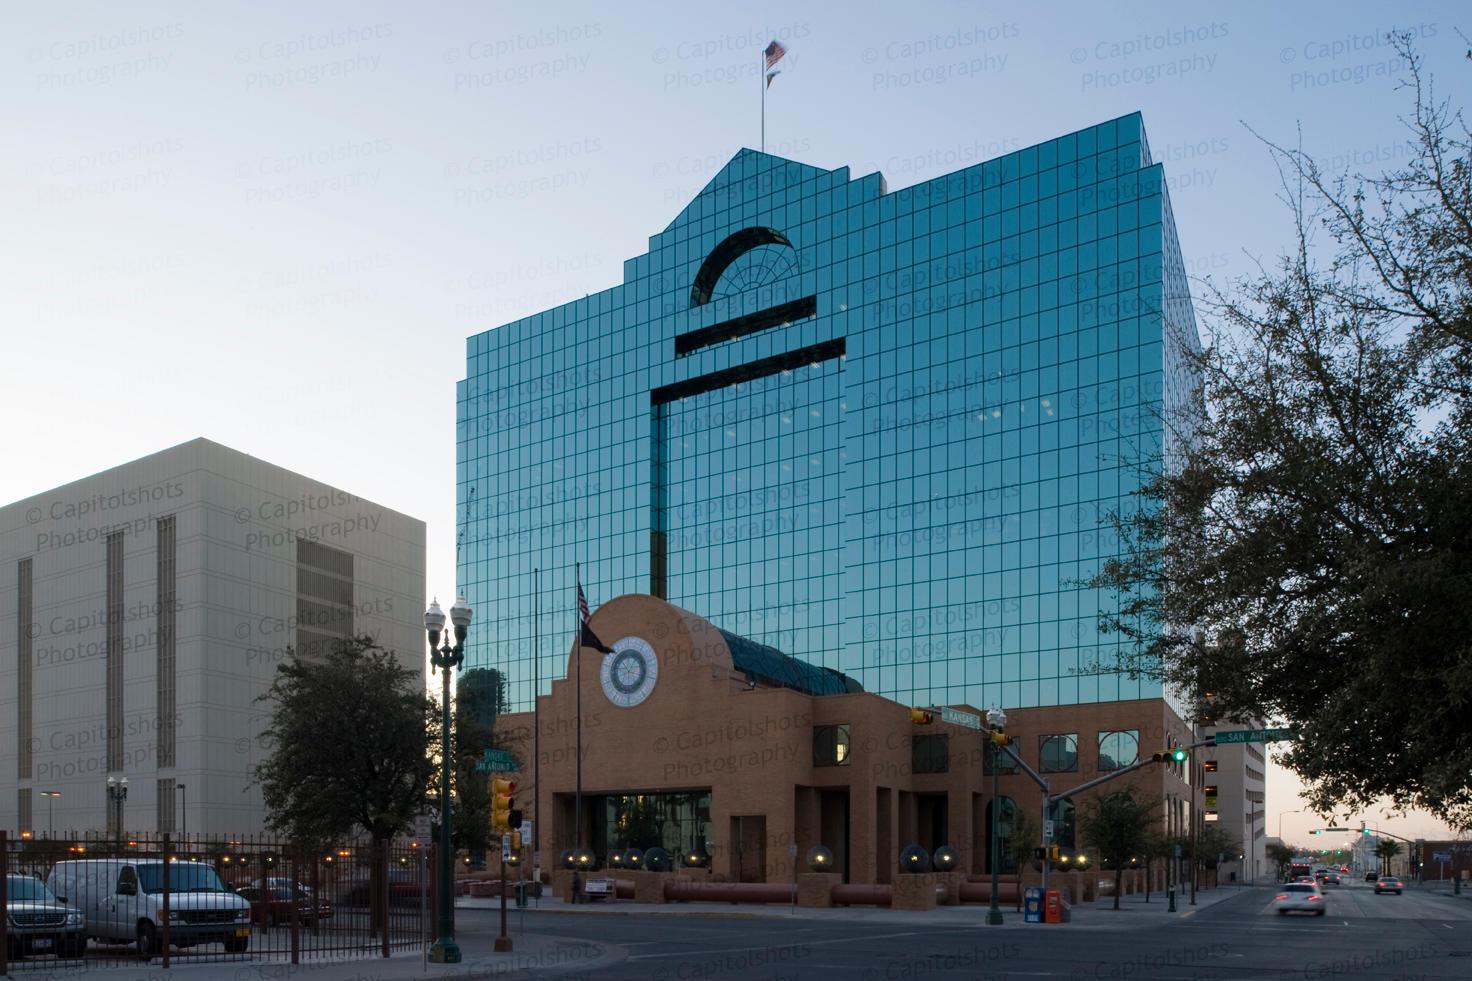 EL Paso County Court House